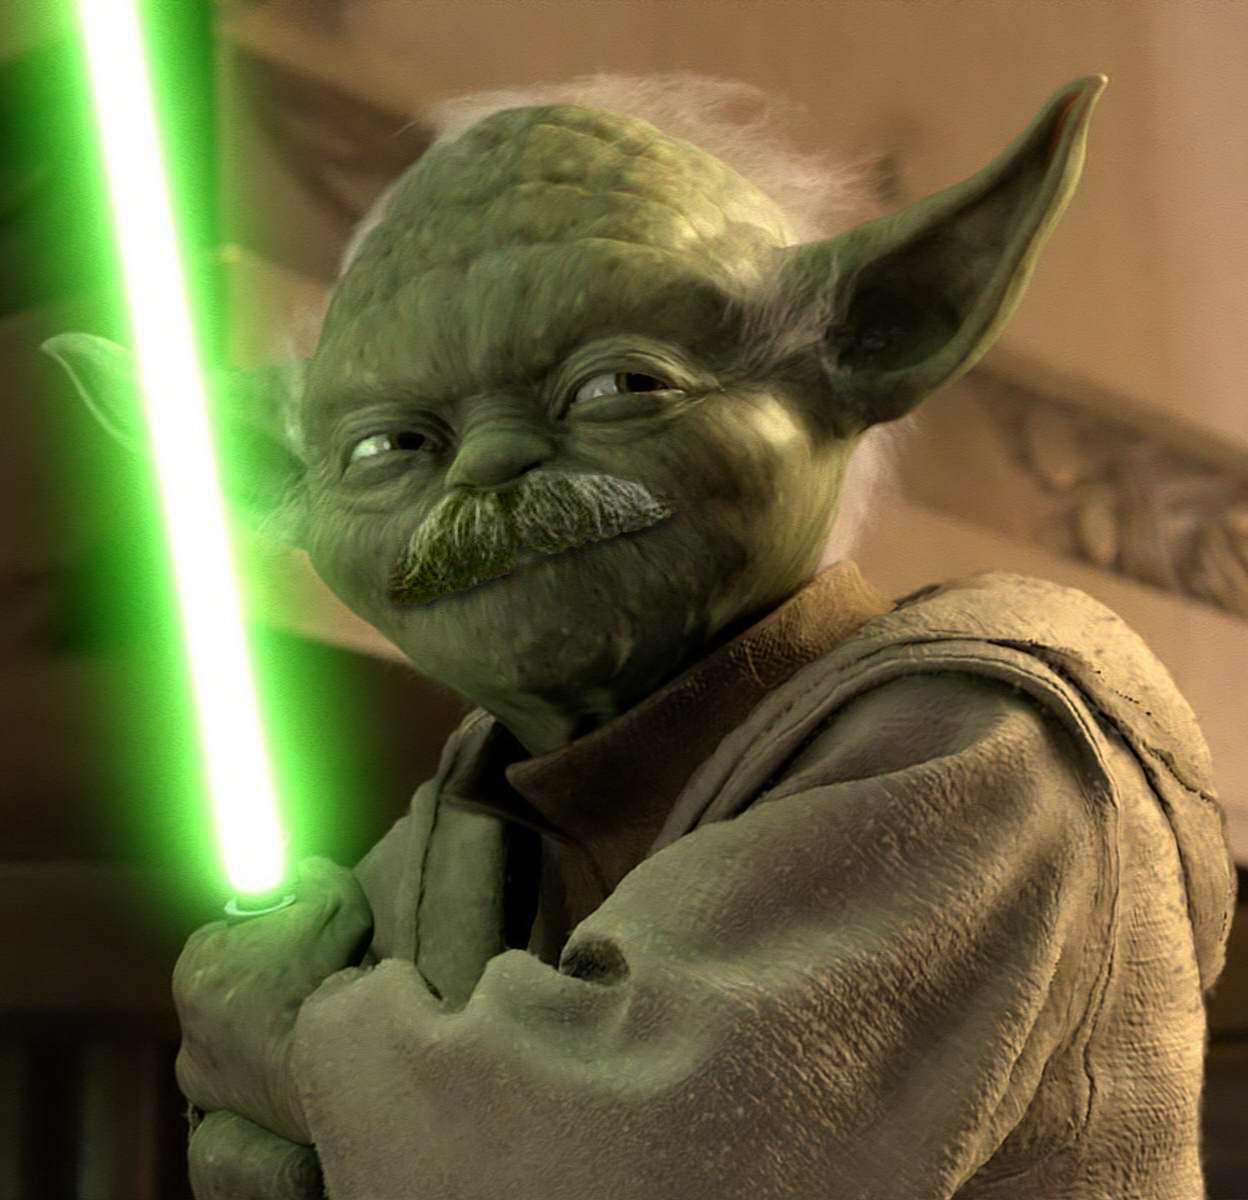 Célèbre Star Wars - A Full Moustache New Hope / yoda #starwars #rogueone  DQ09